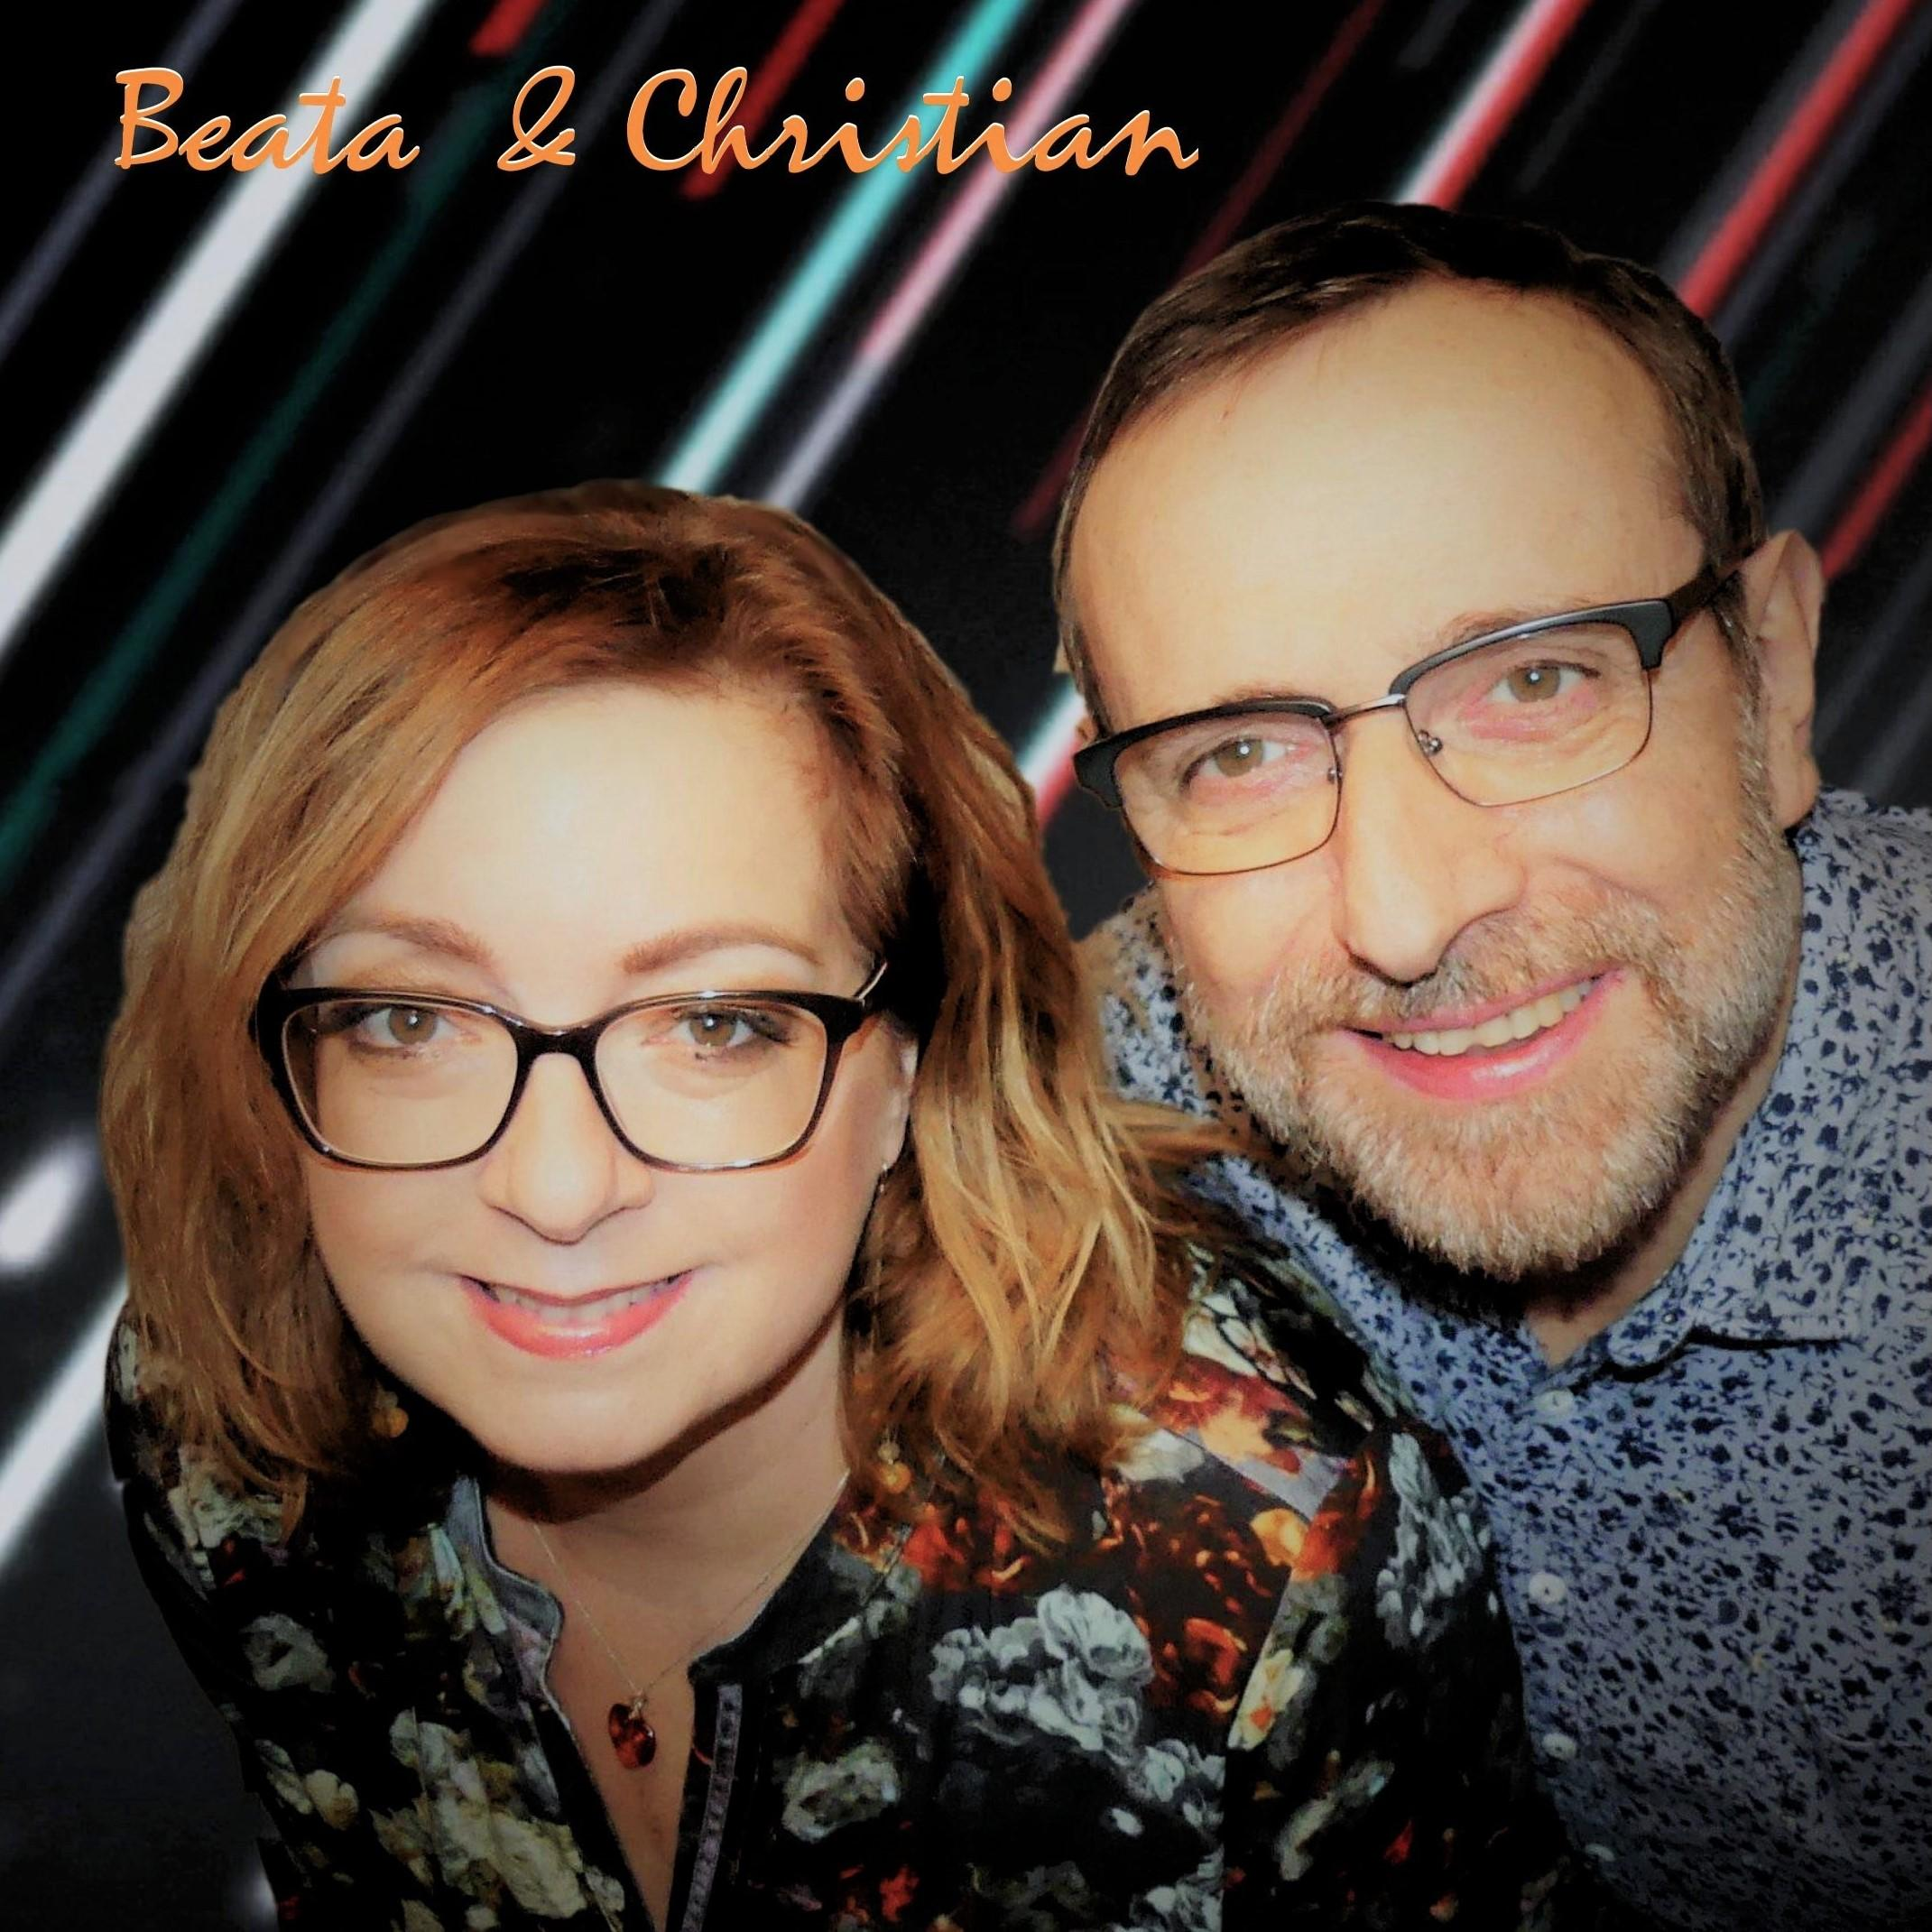 Beata Christian Nasze kamraty